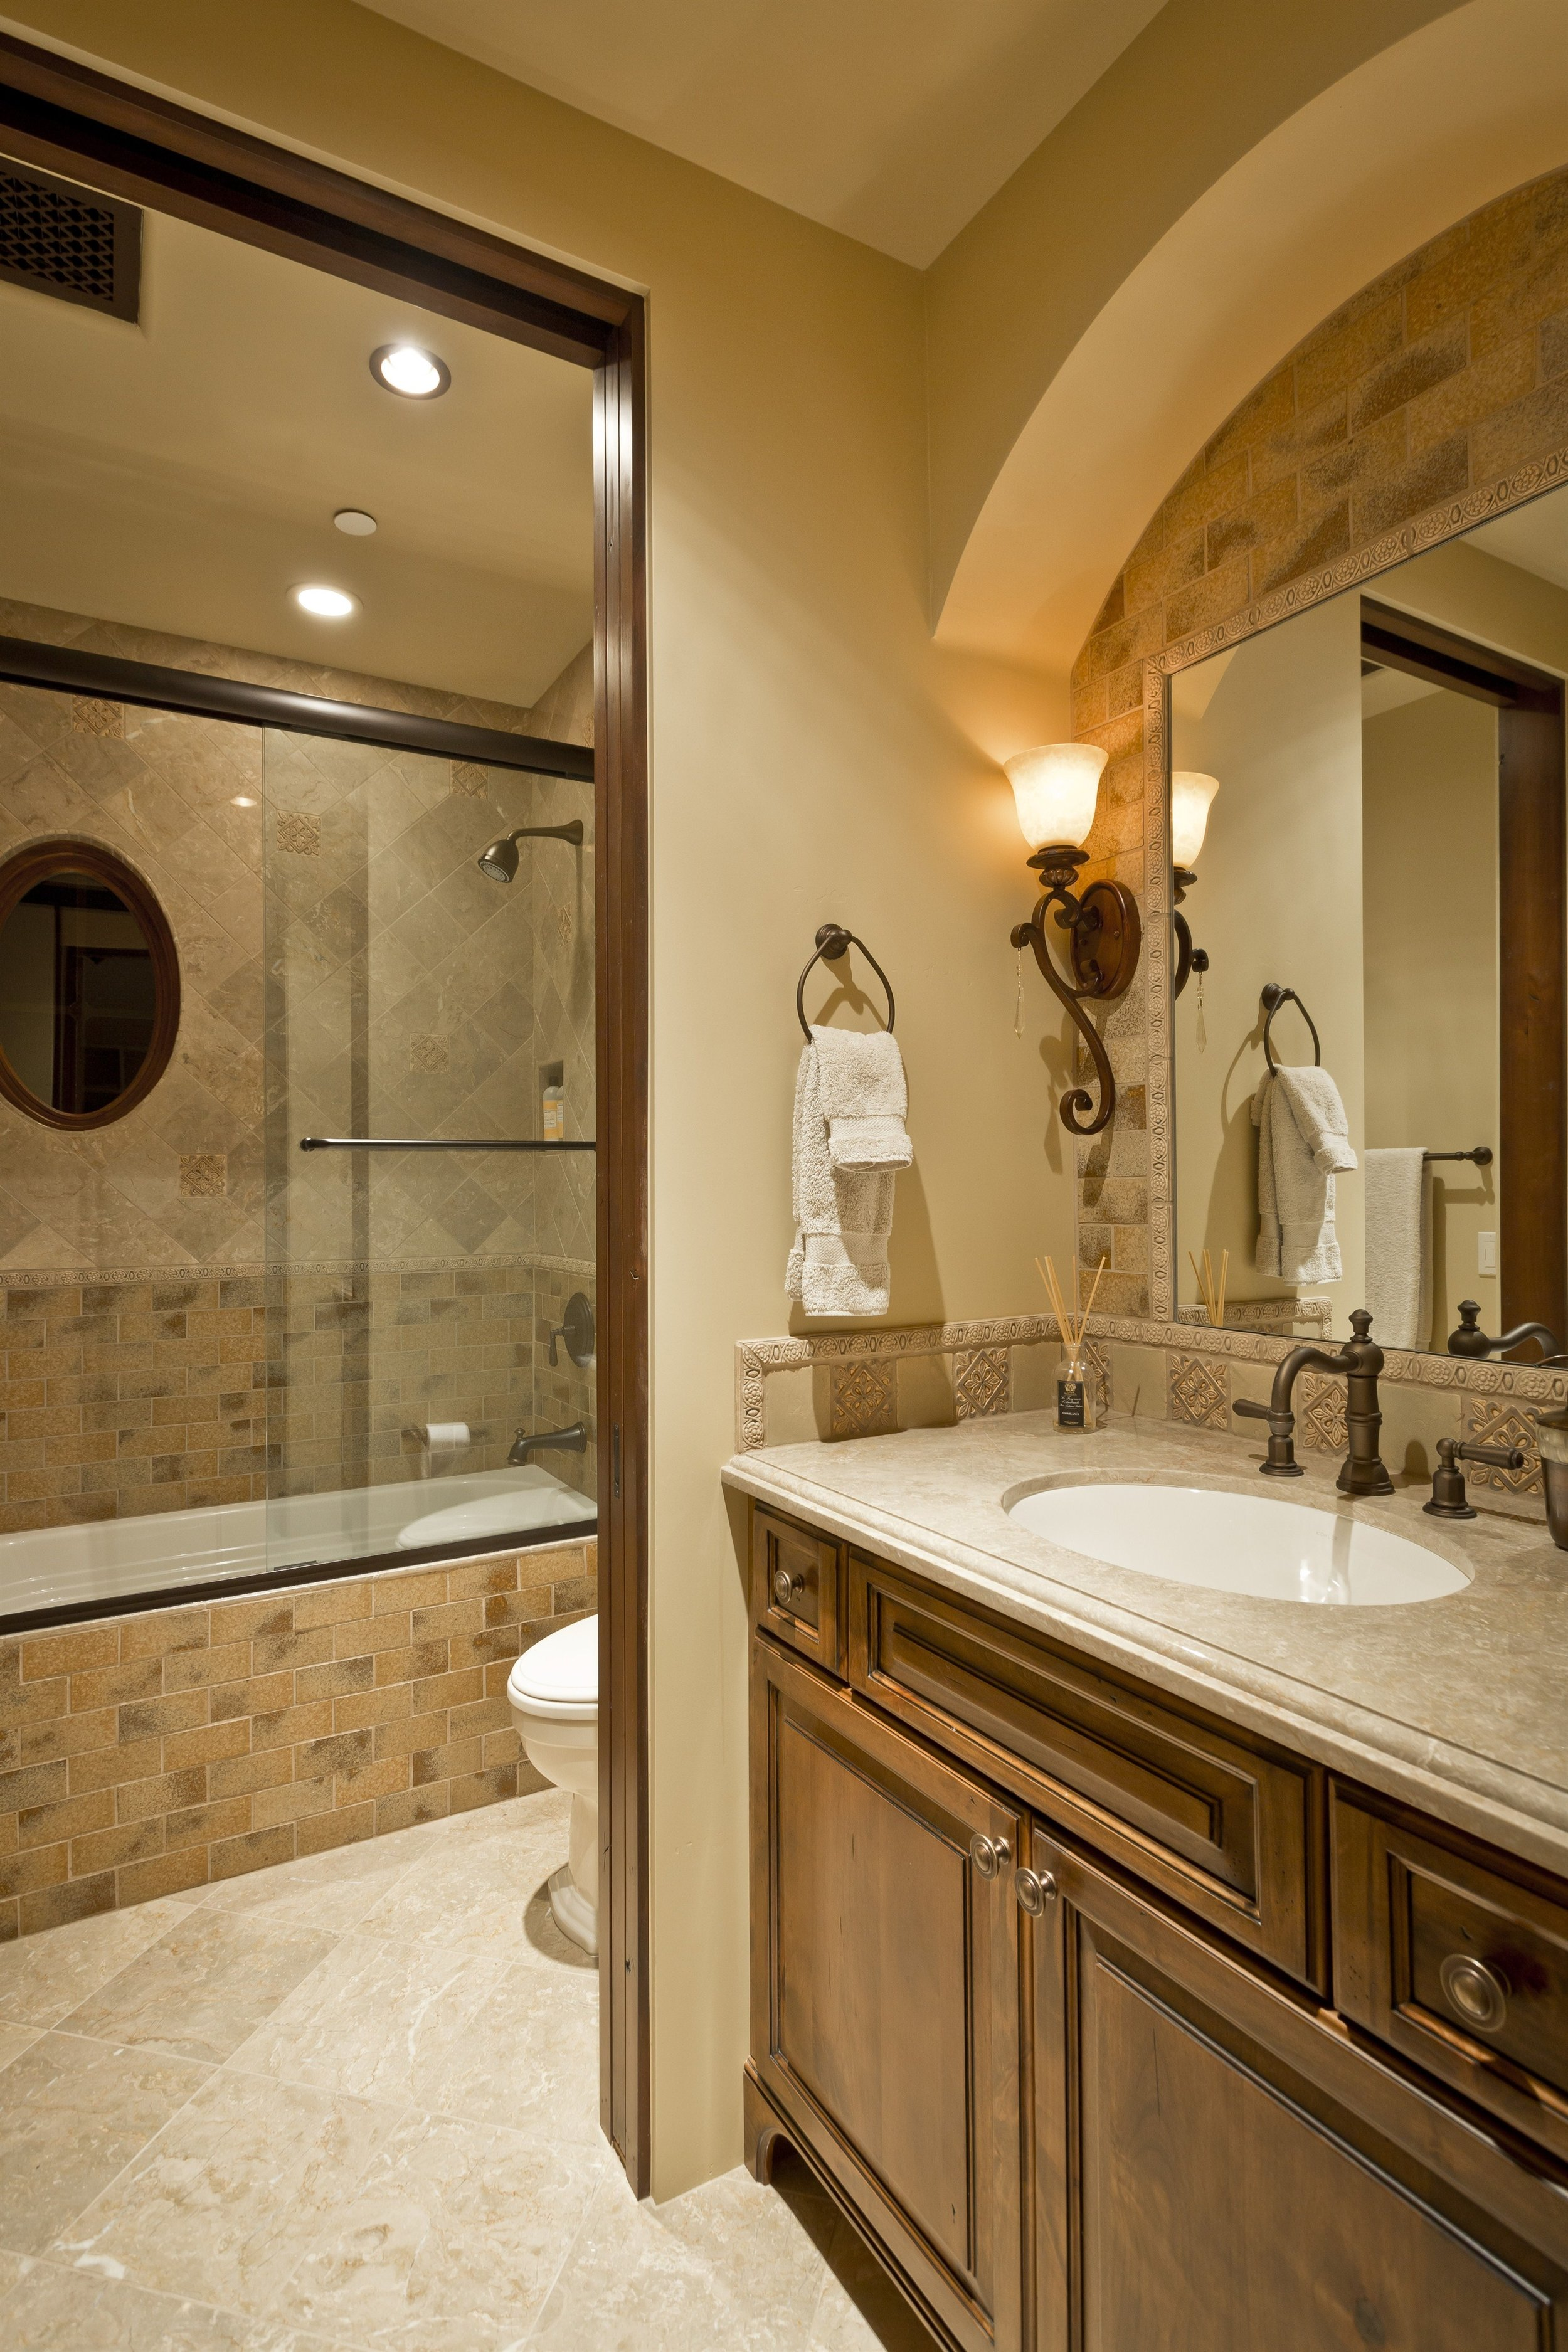 025_Bathroom.jpg